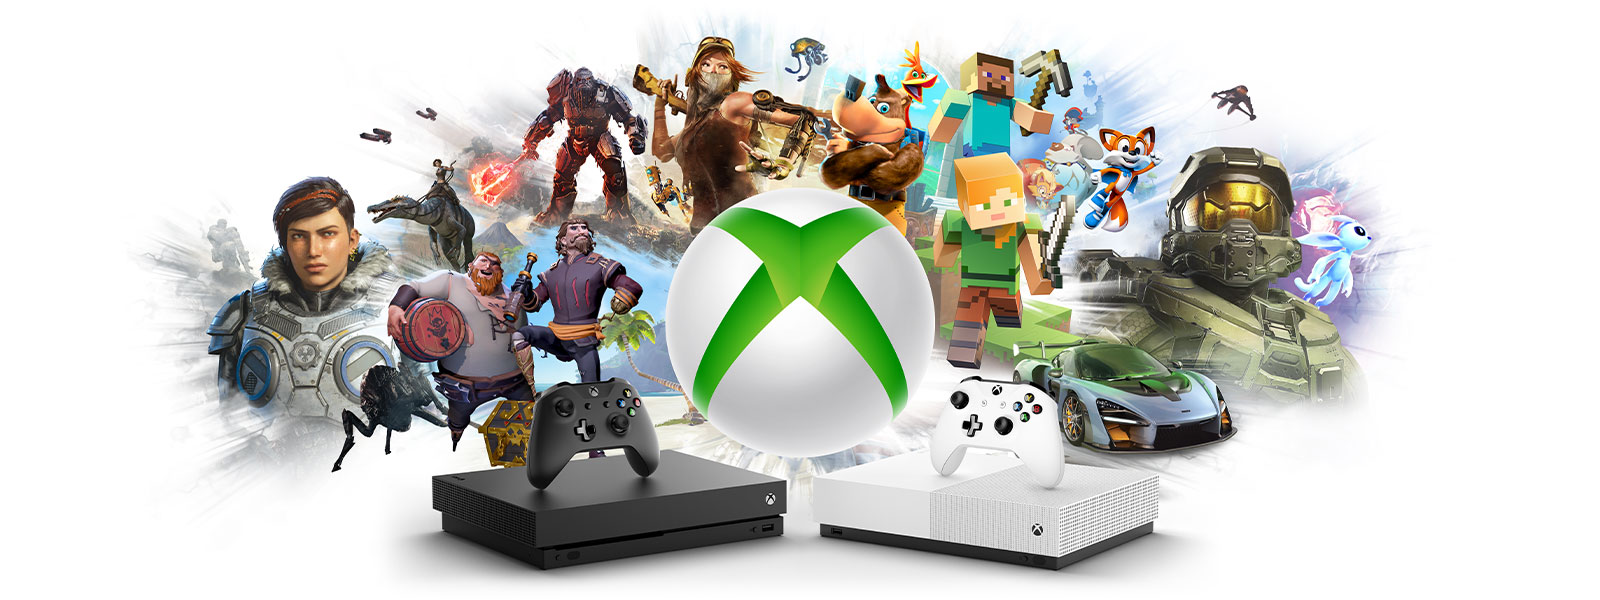 کارت اشتراک Xbox Game Pass 14 Days